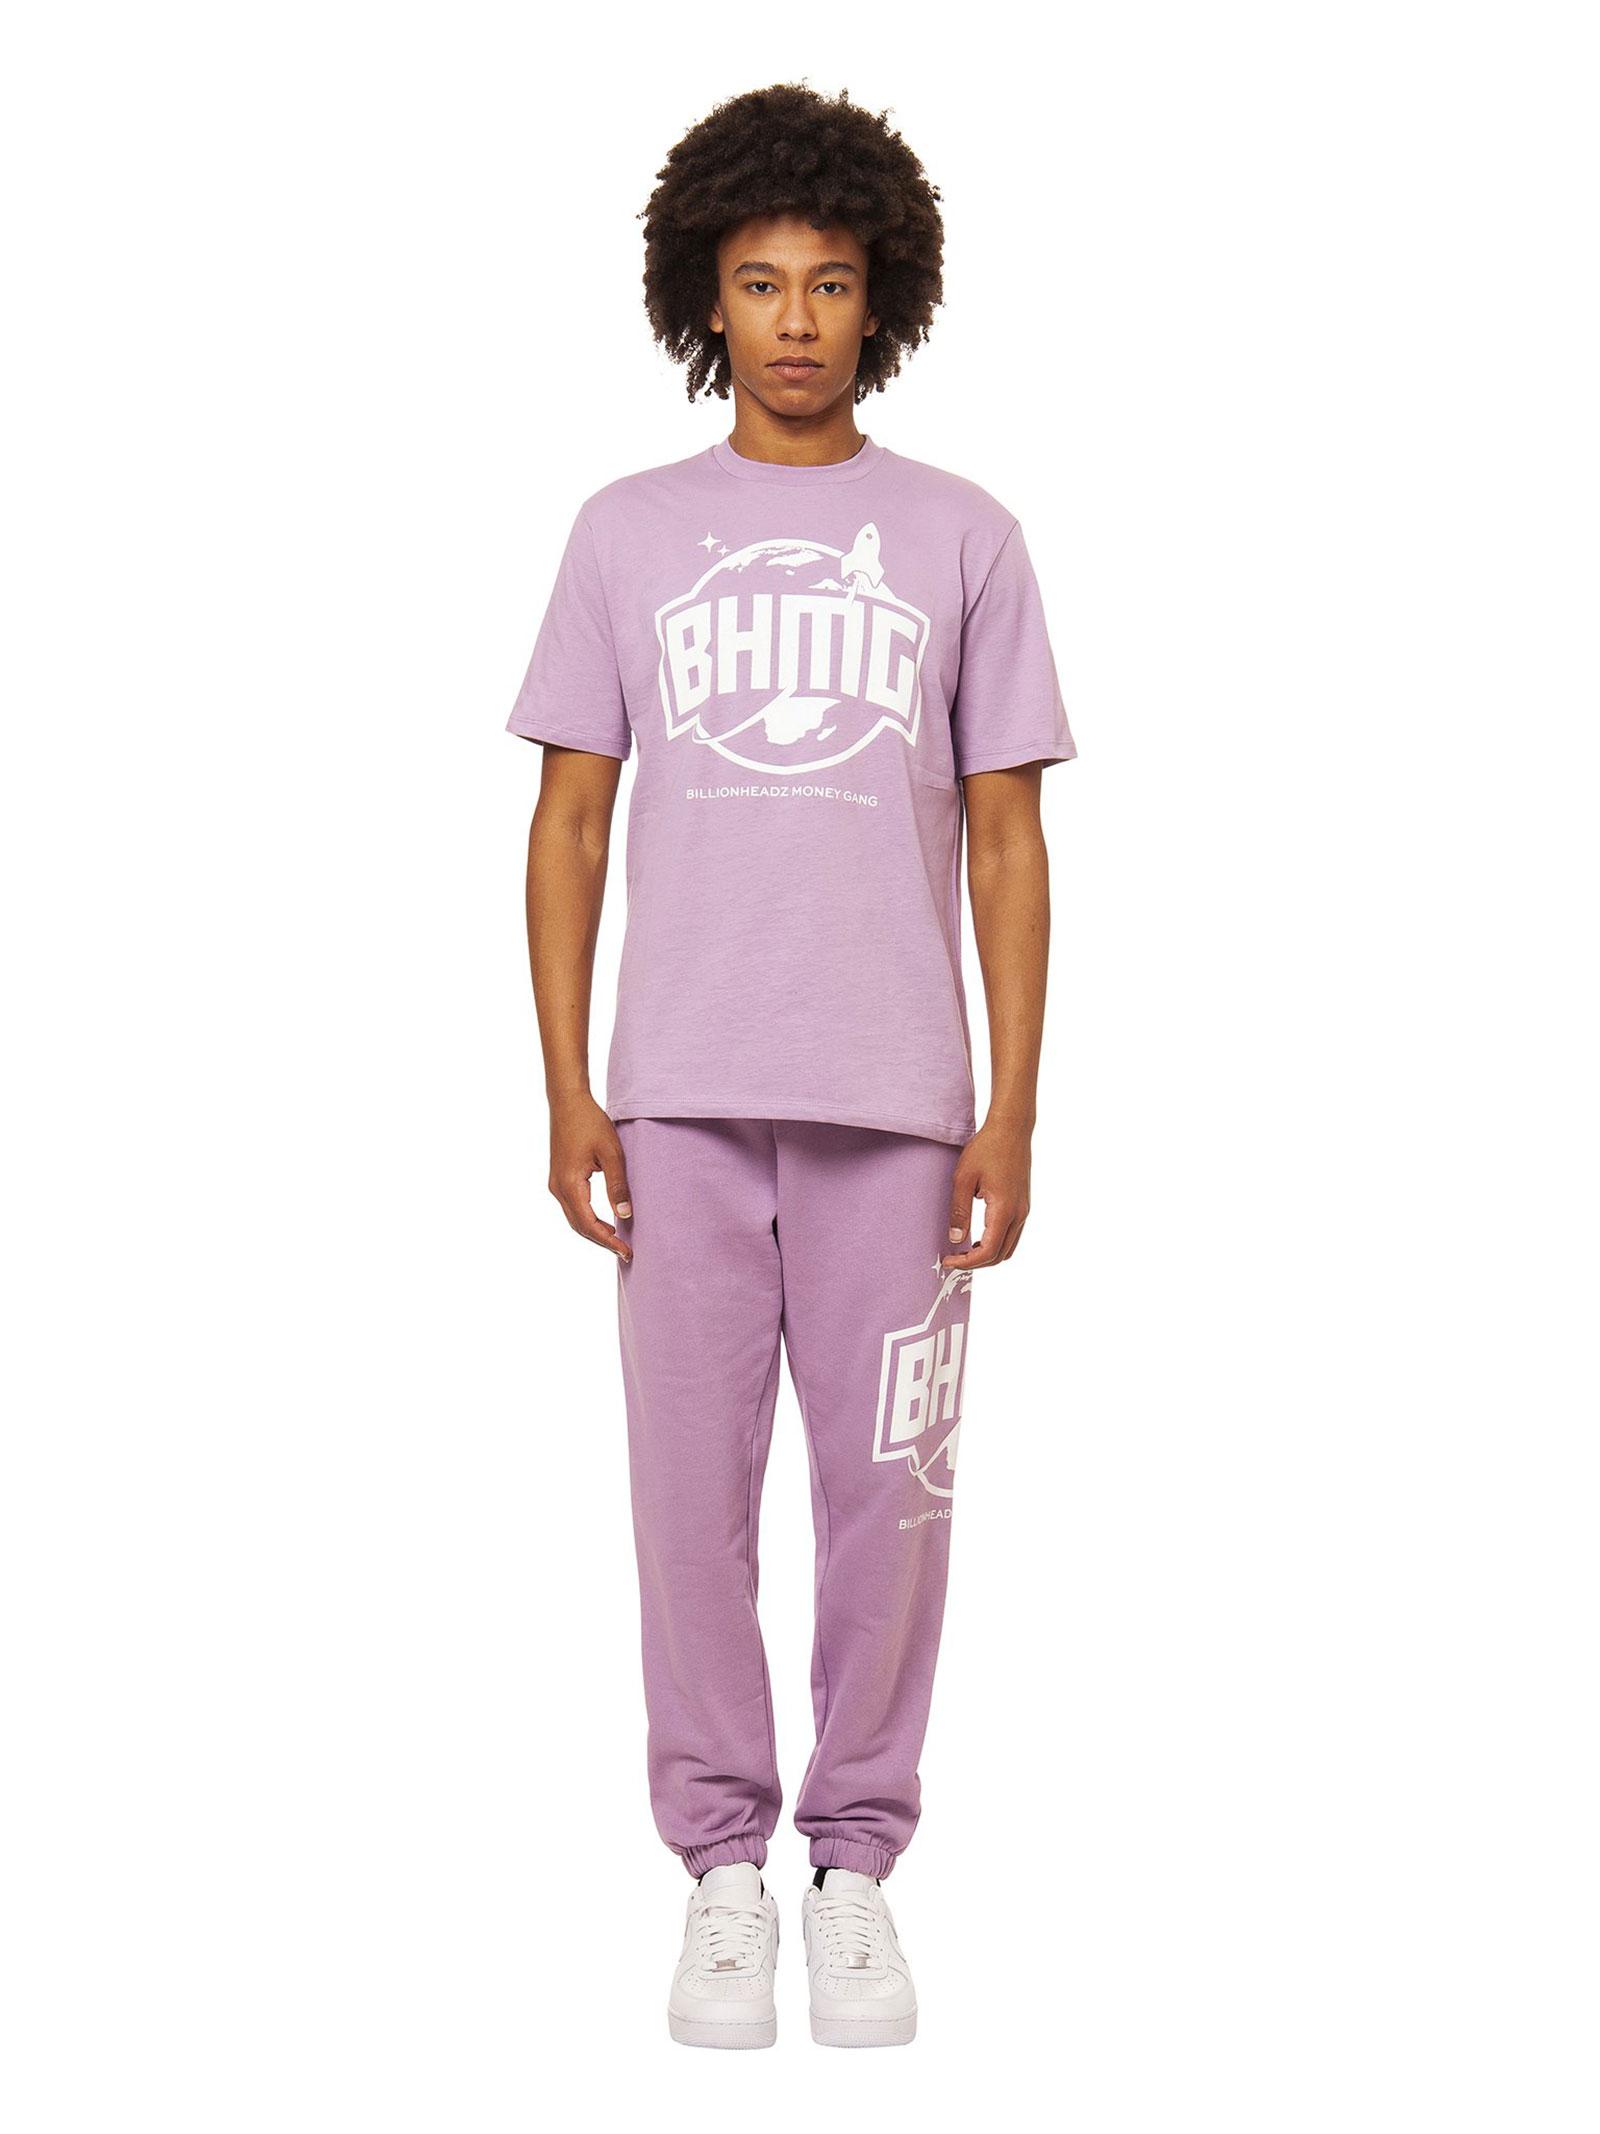 Tee logata BHMG   T-shirt   028328GLICINE